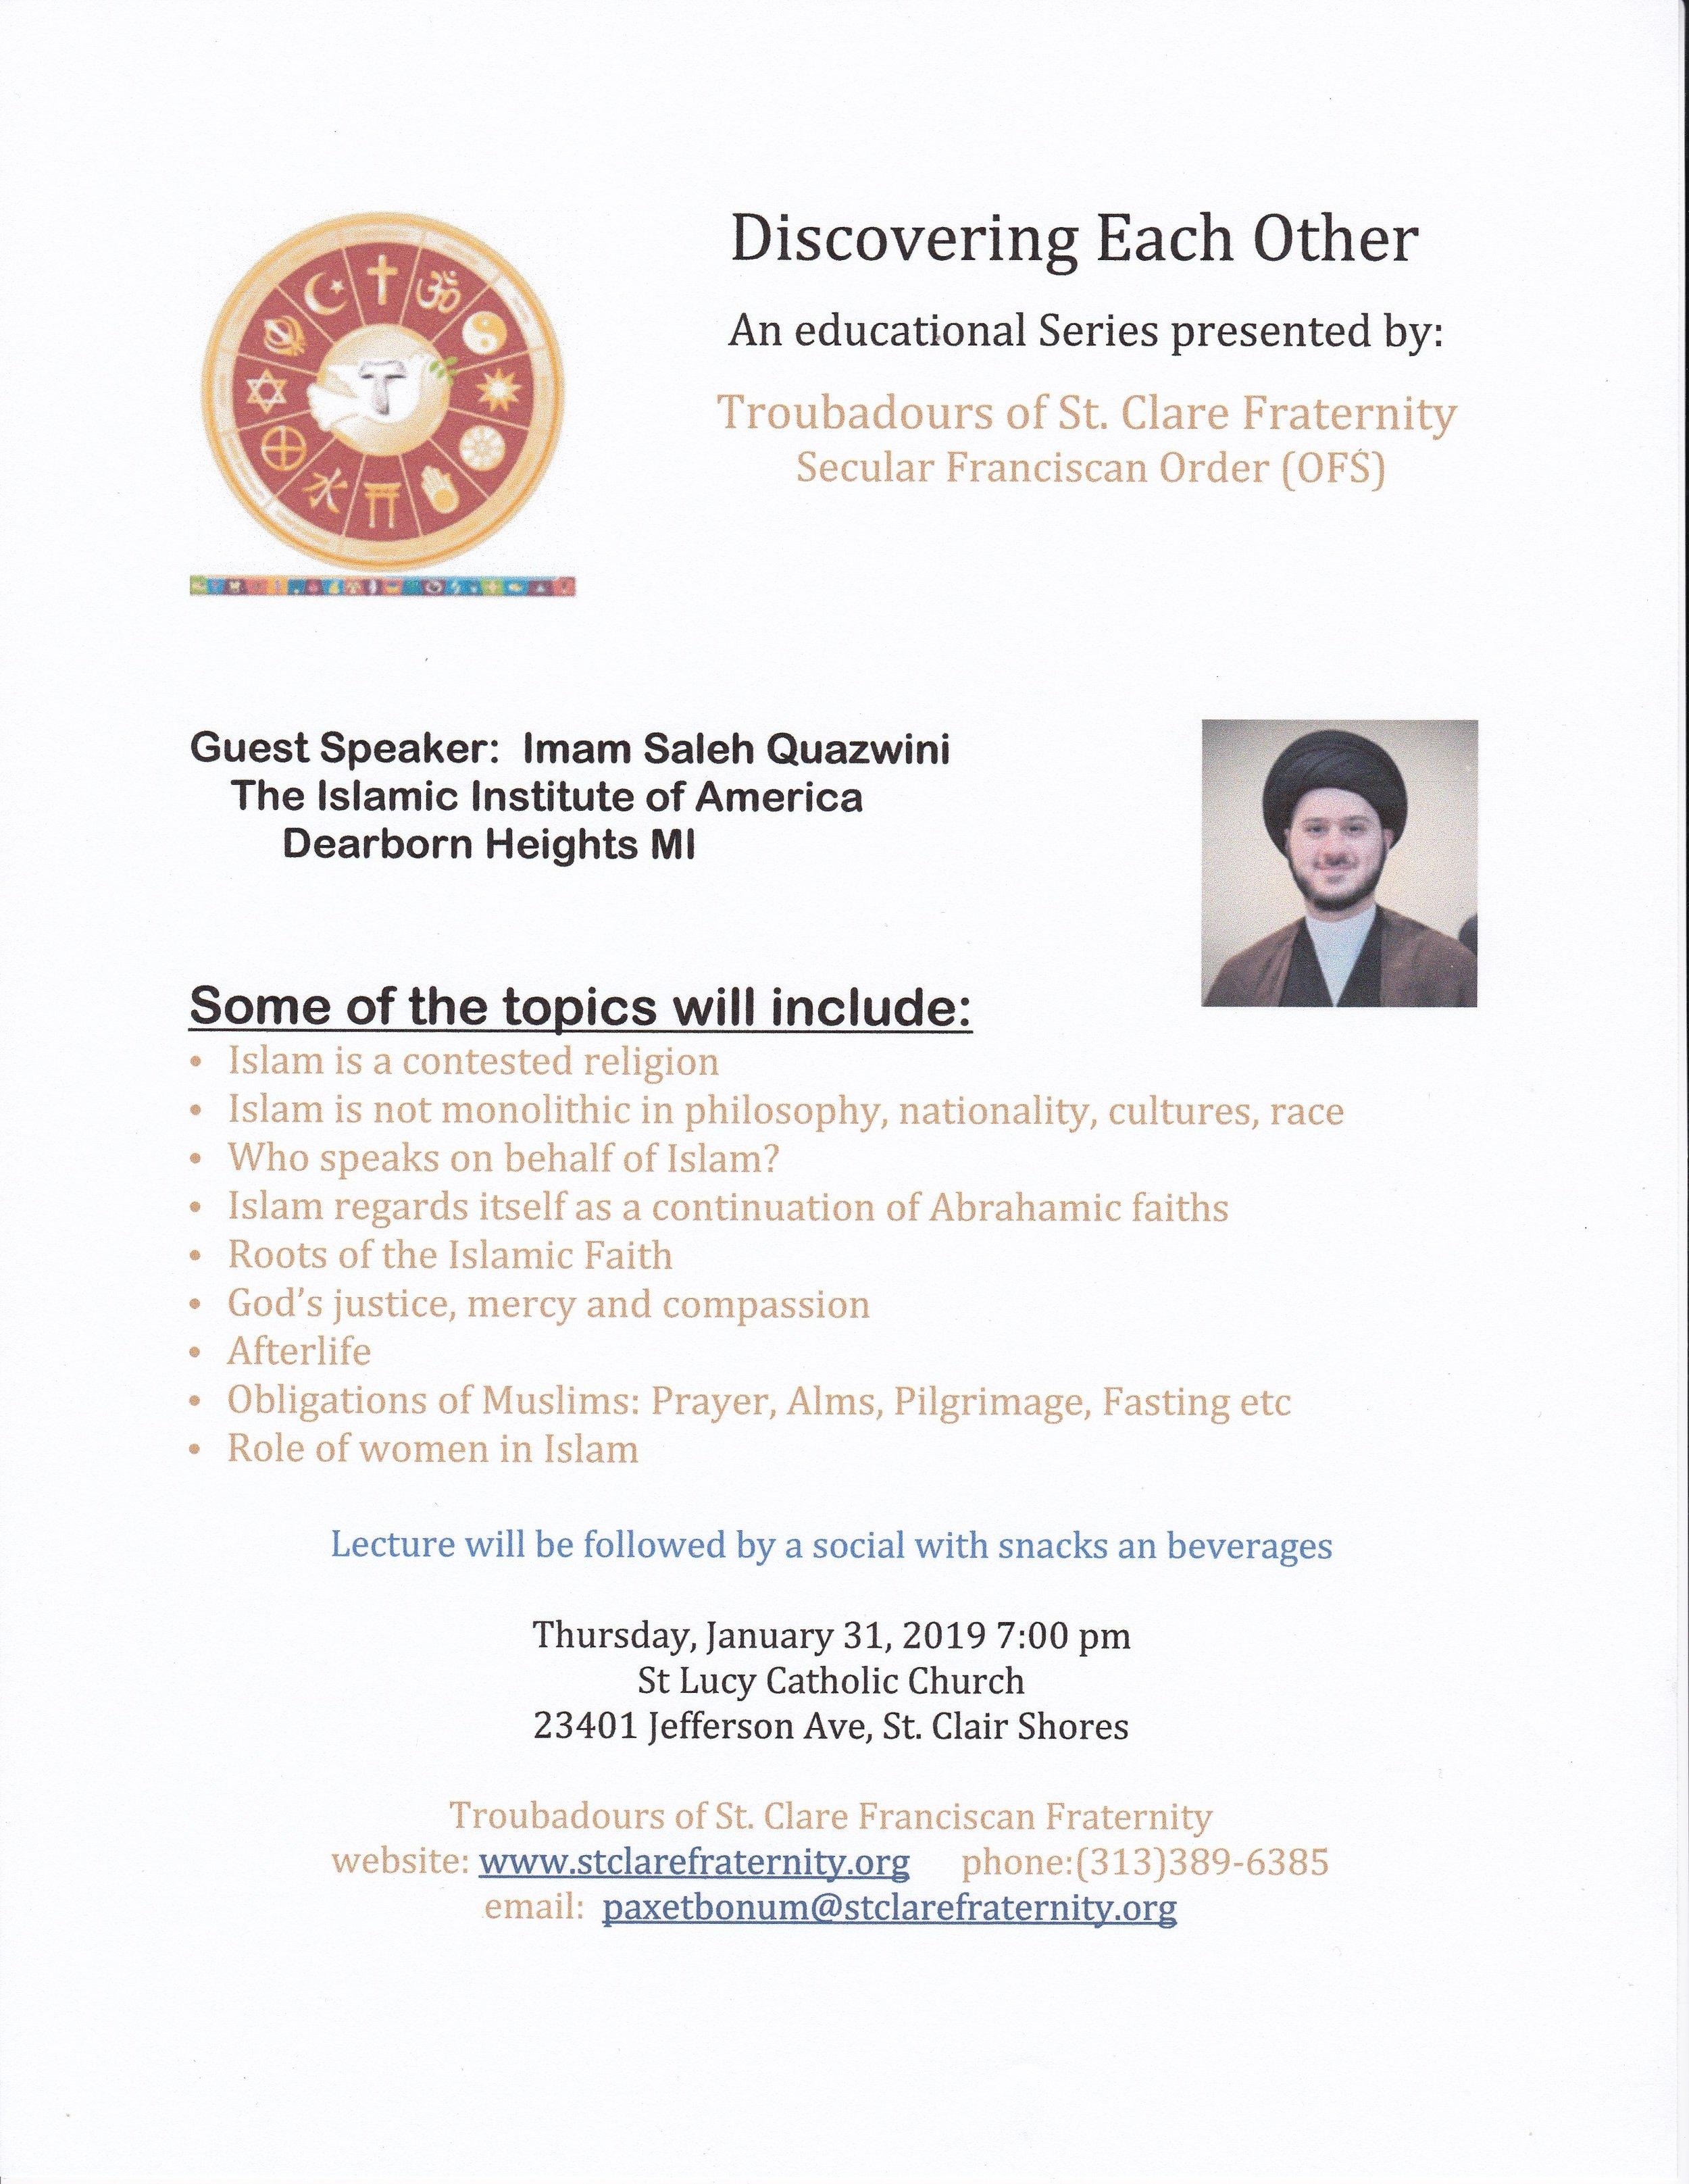 1-31-19 Imam Quazwini Flyer.jpg